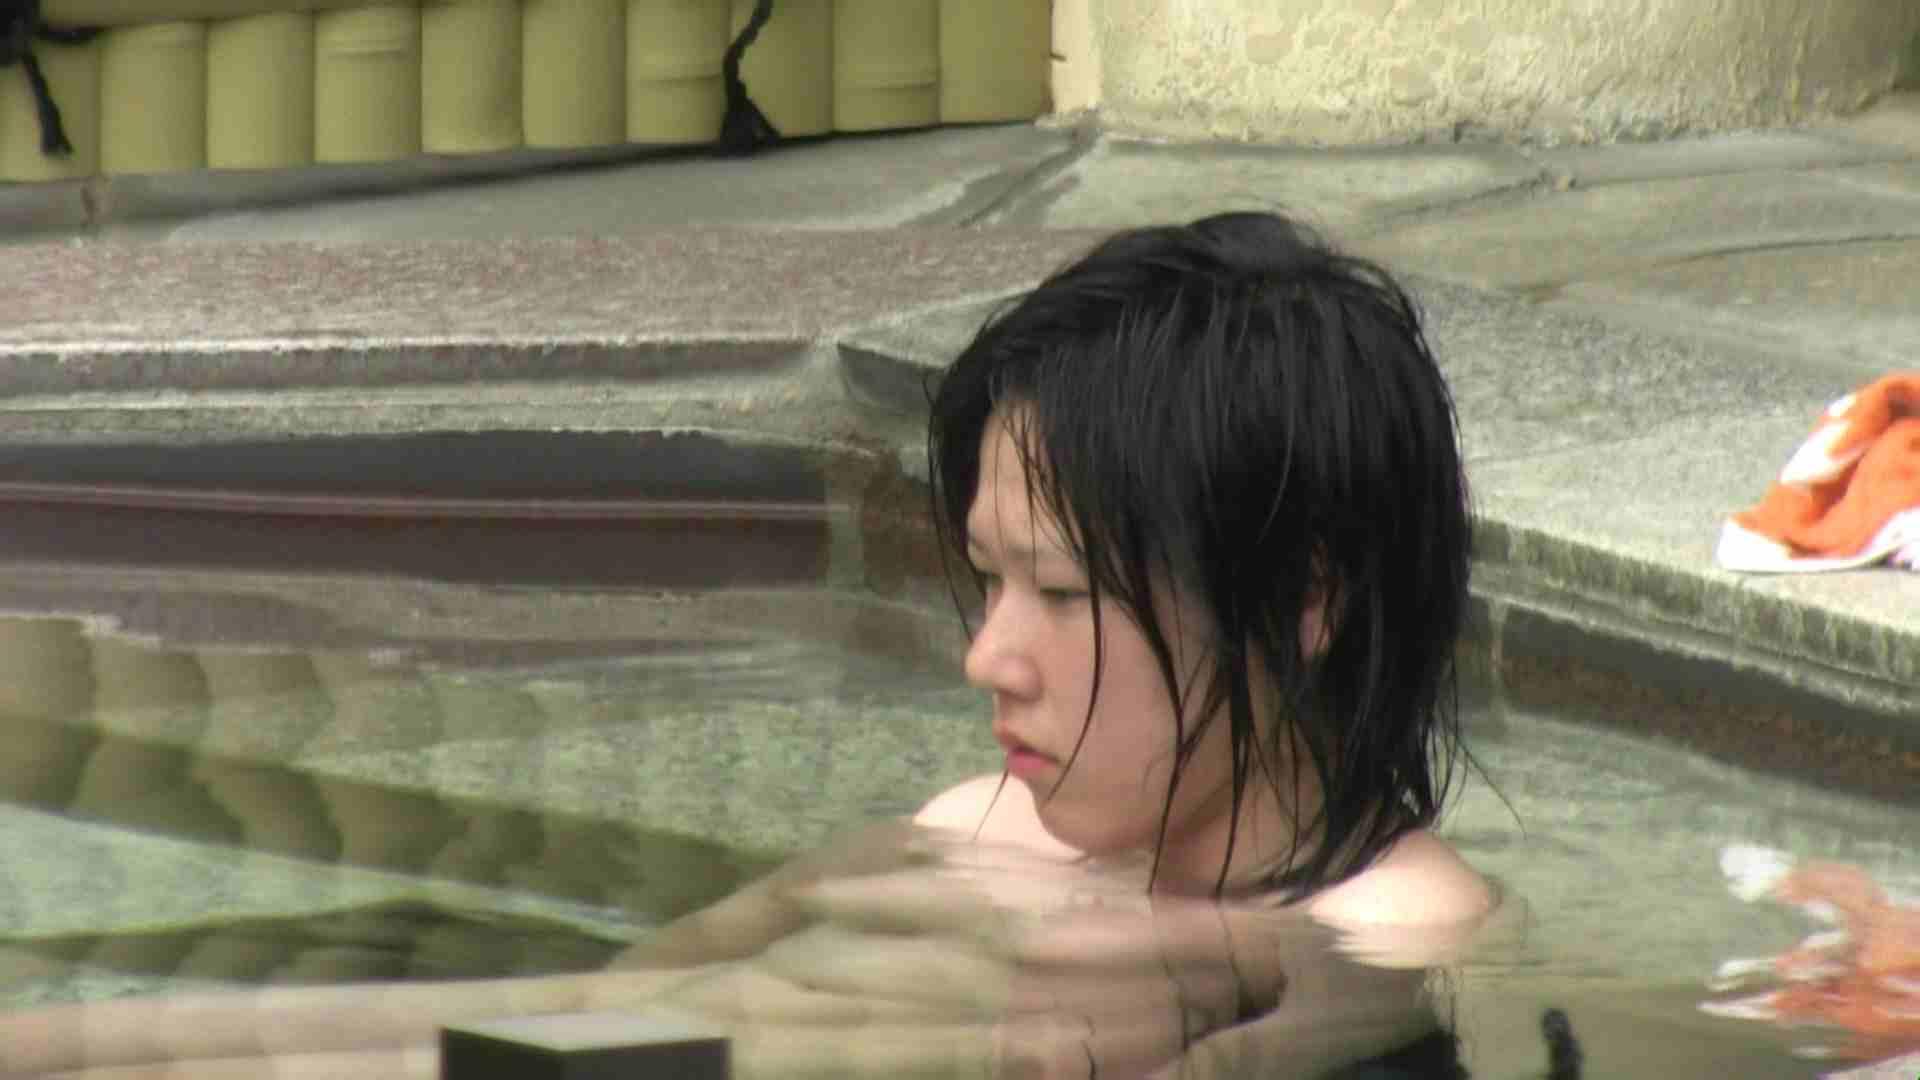 Aquaな露天風呂Vol.36 露天 のぞき動画画像 78連発 44